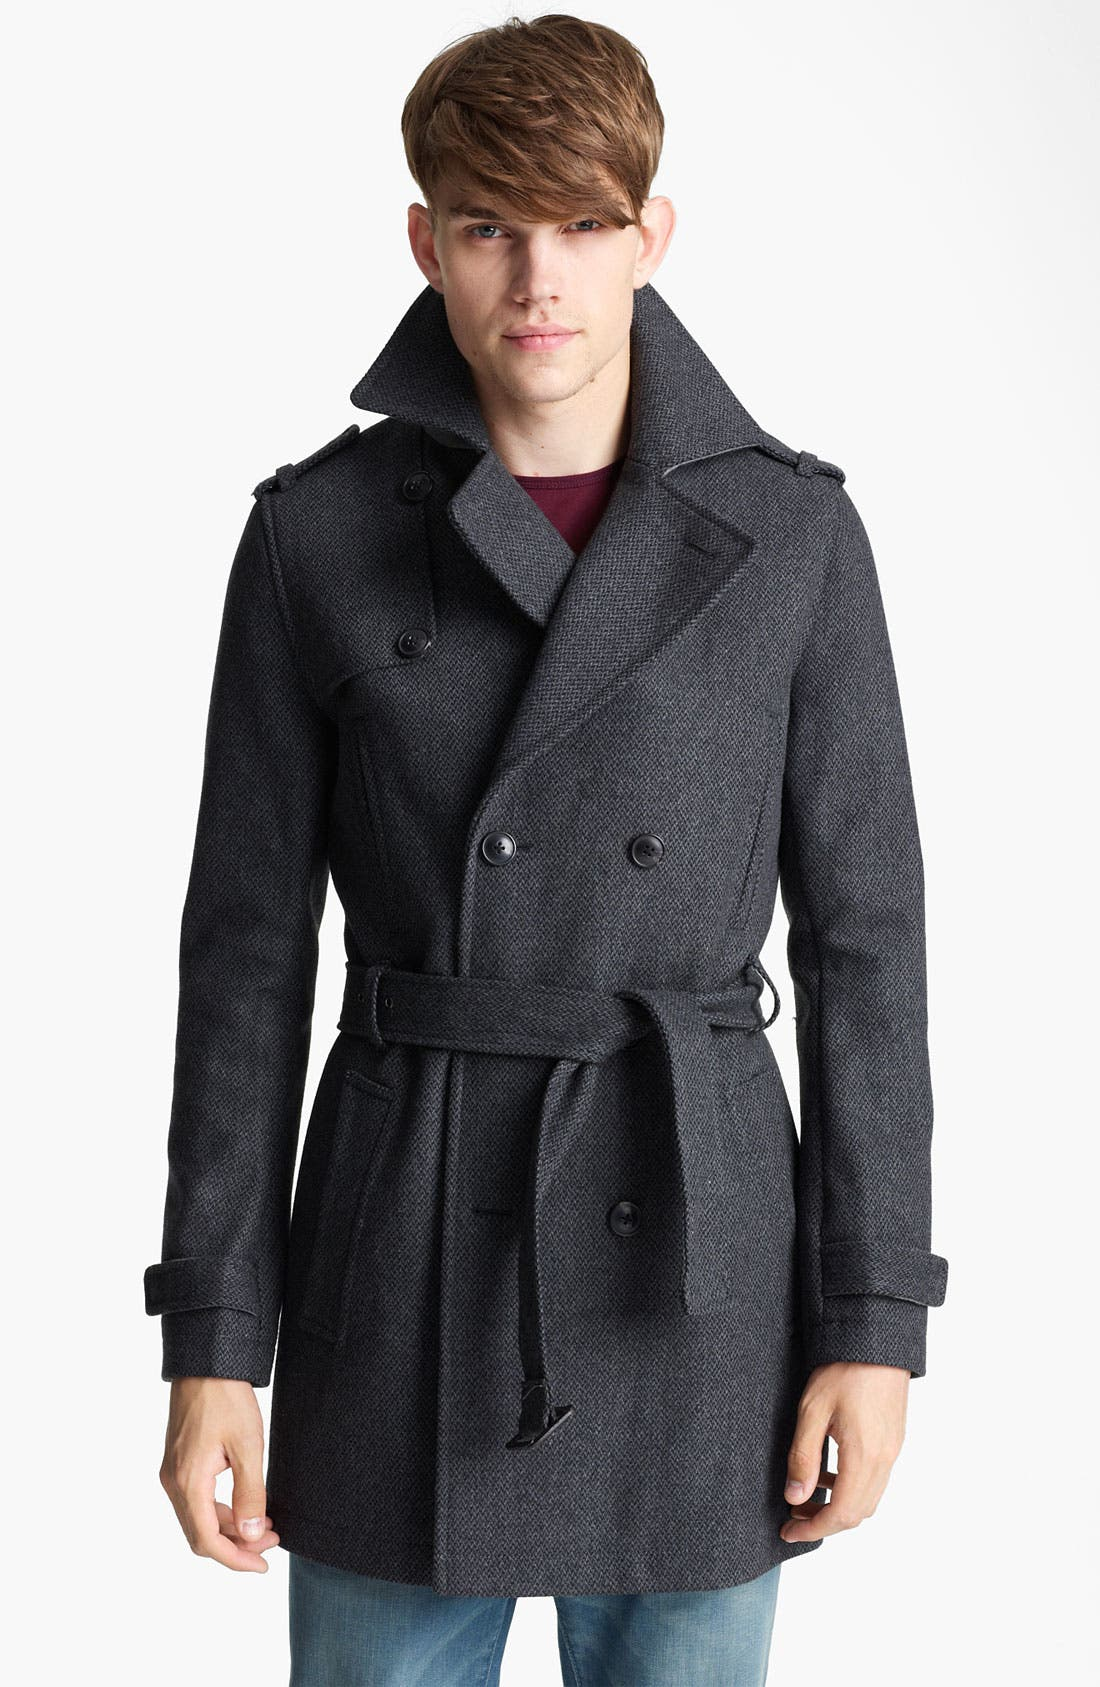 Alternate Image 1 Selected - Topman Wool Blend Trench Coat